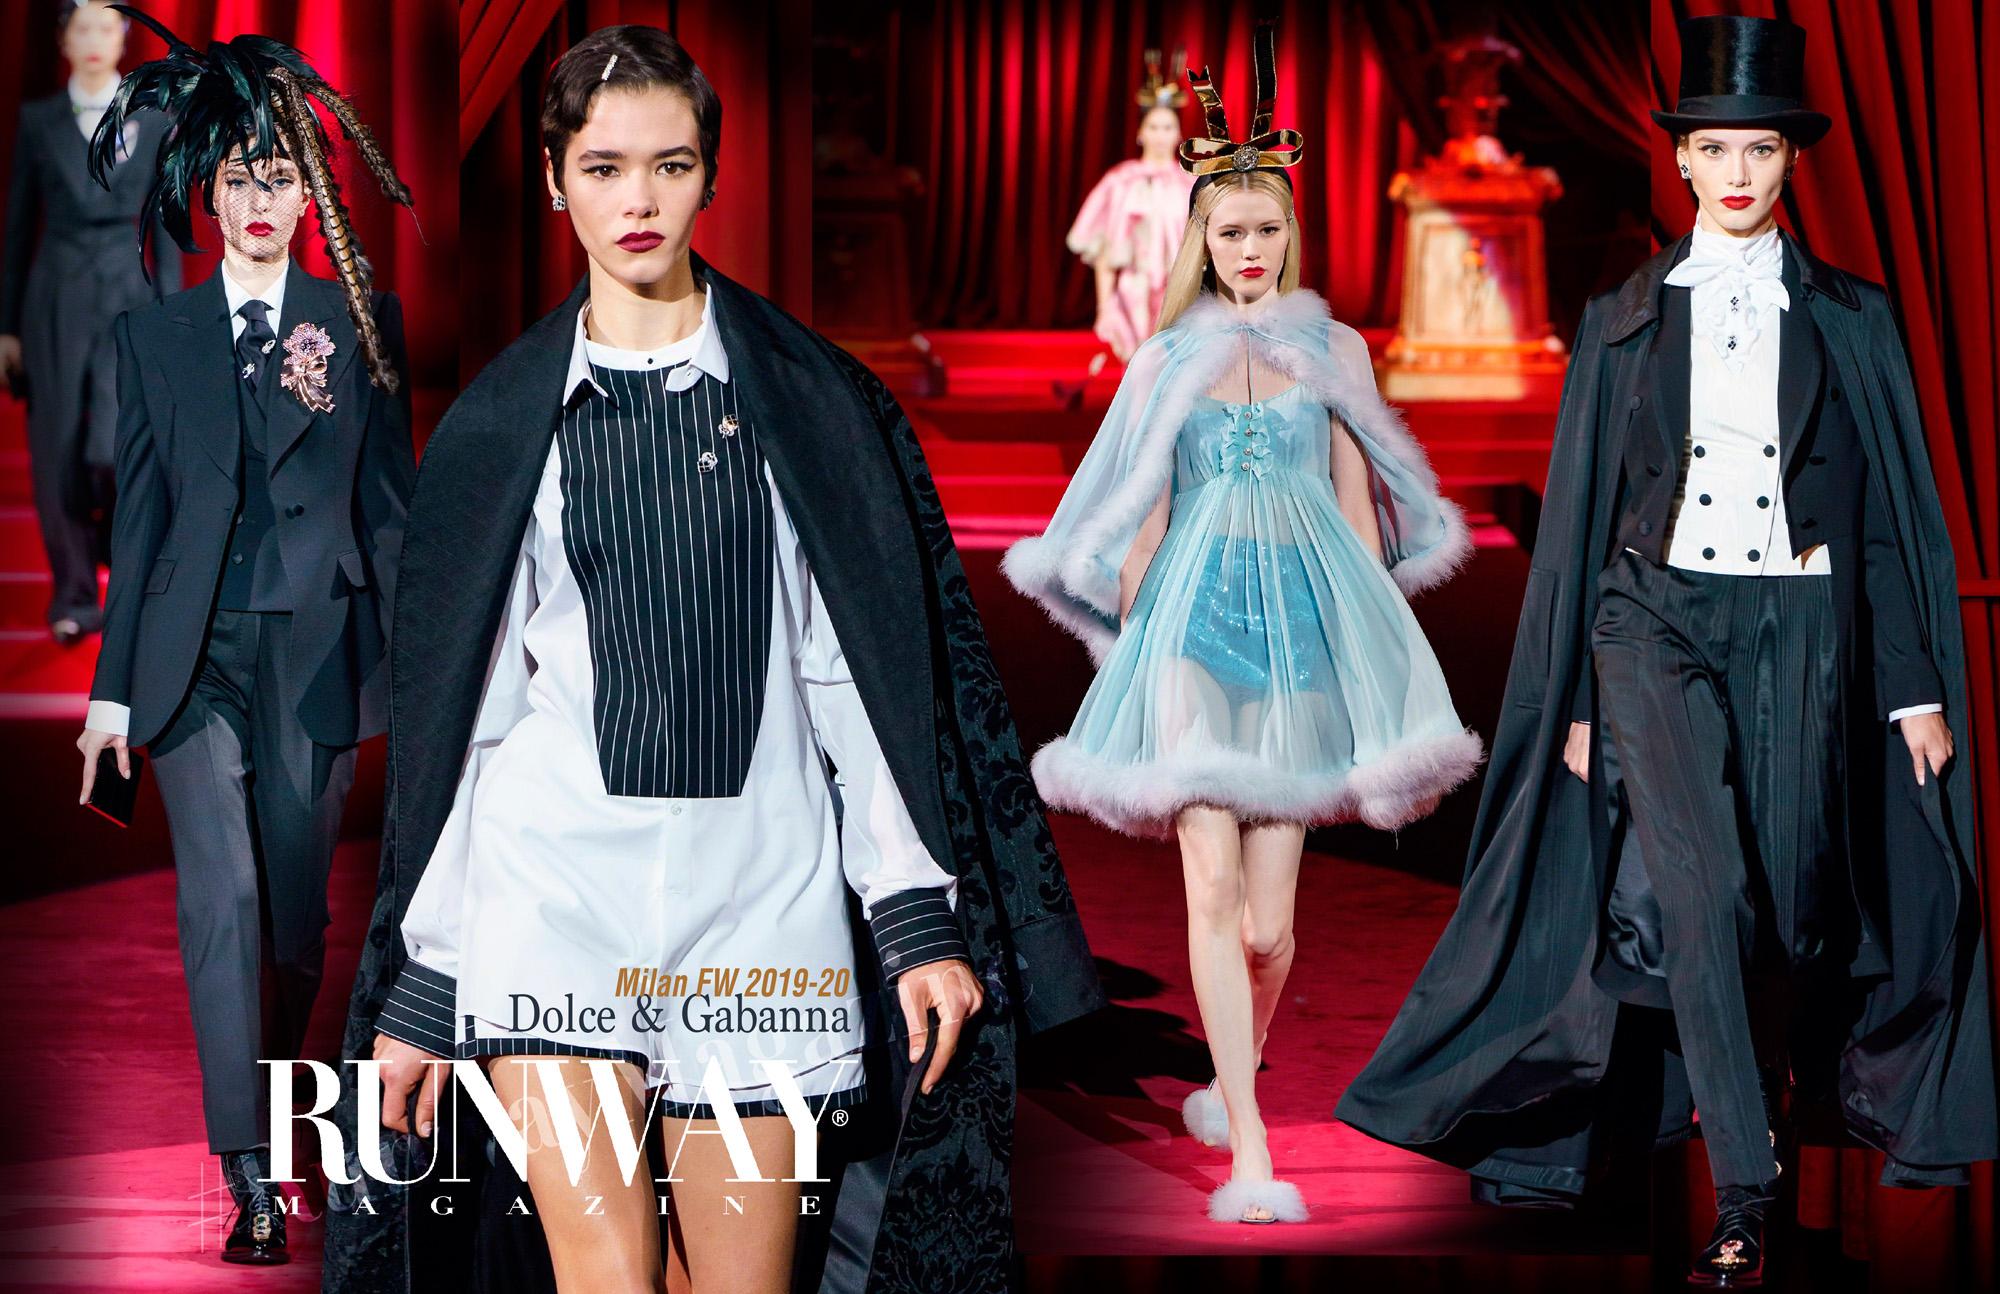 Dolce Gabanna Fall-Winter 2019-2020 Milan Fashion Week by Runway Magazine